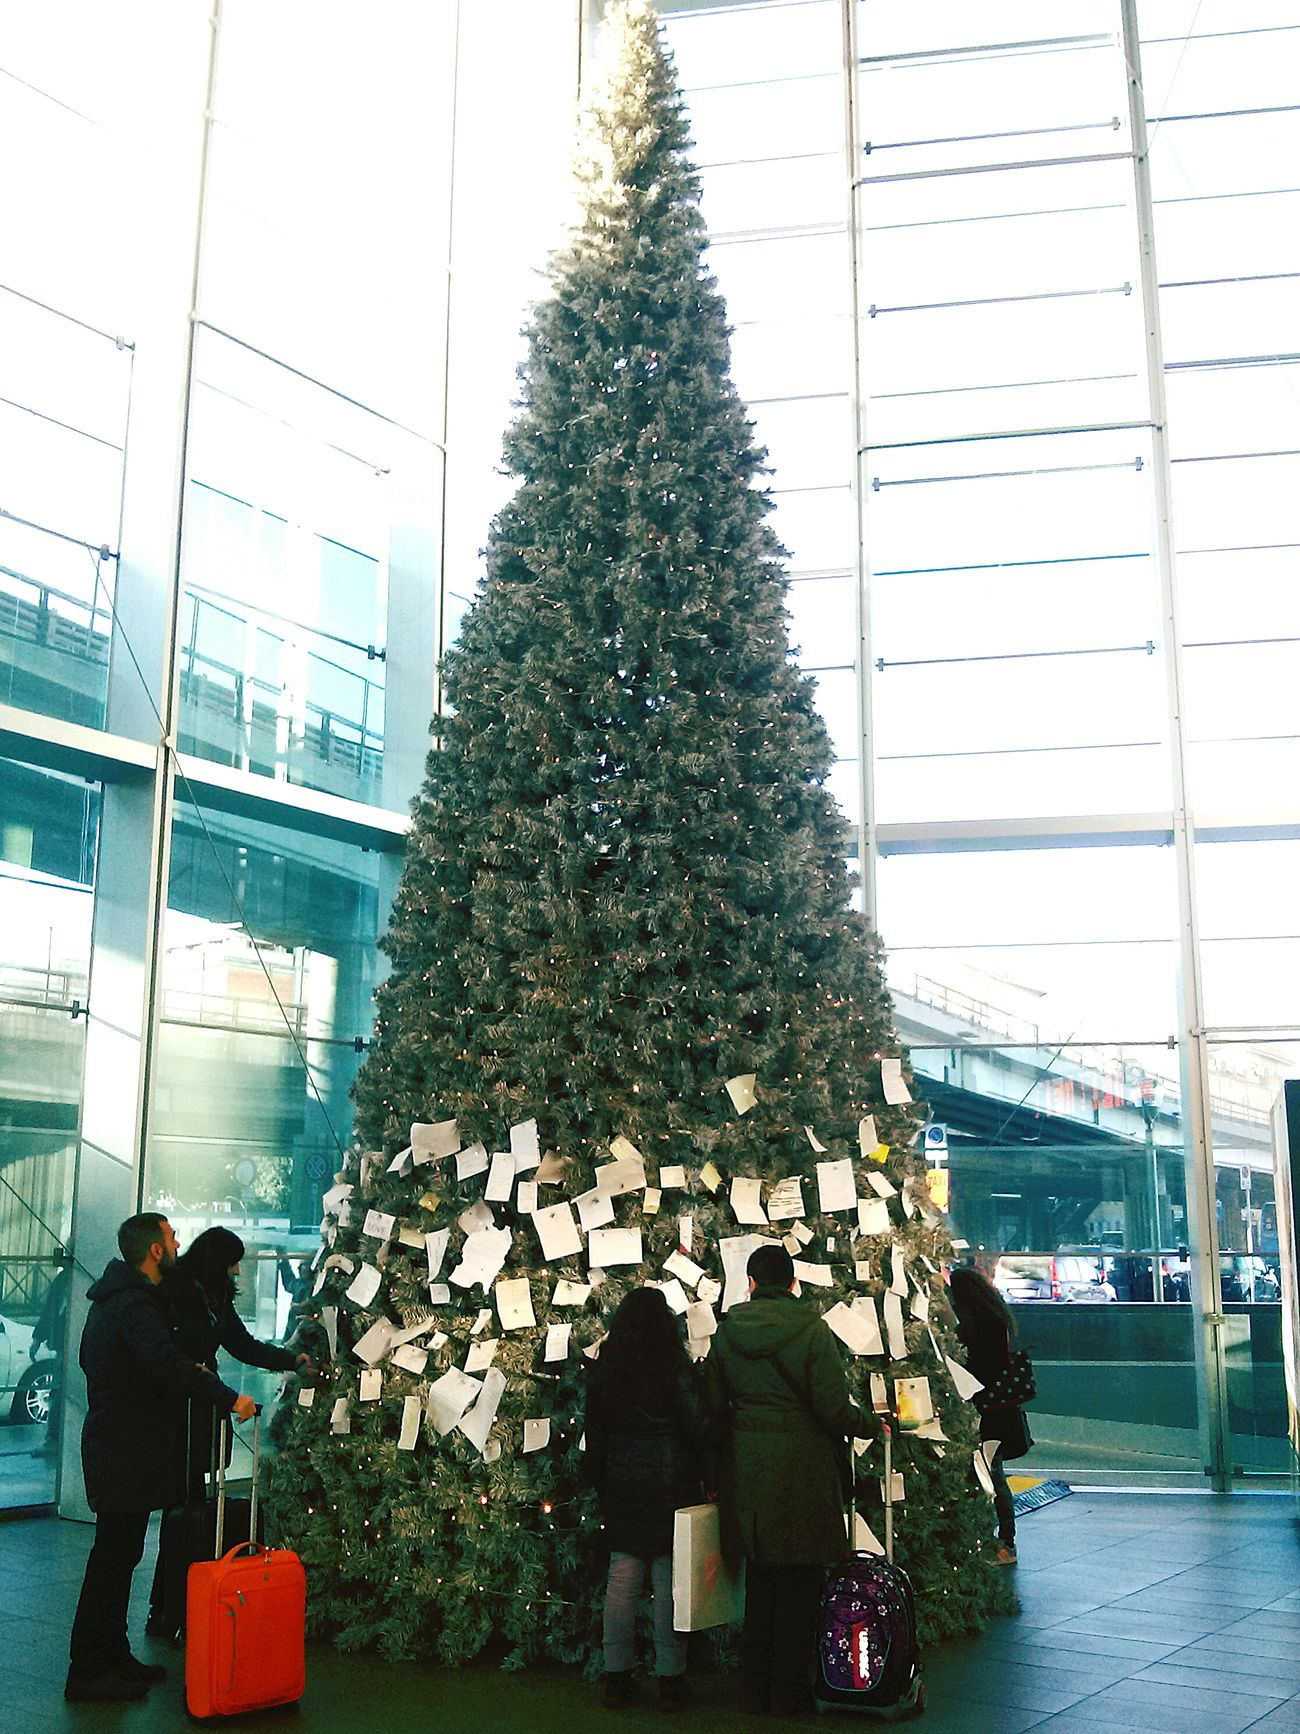 Stazione Tiburtina Chrismas Tree Chrismastime Showcase: December Walking Taking Photos